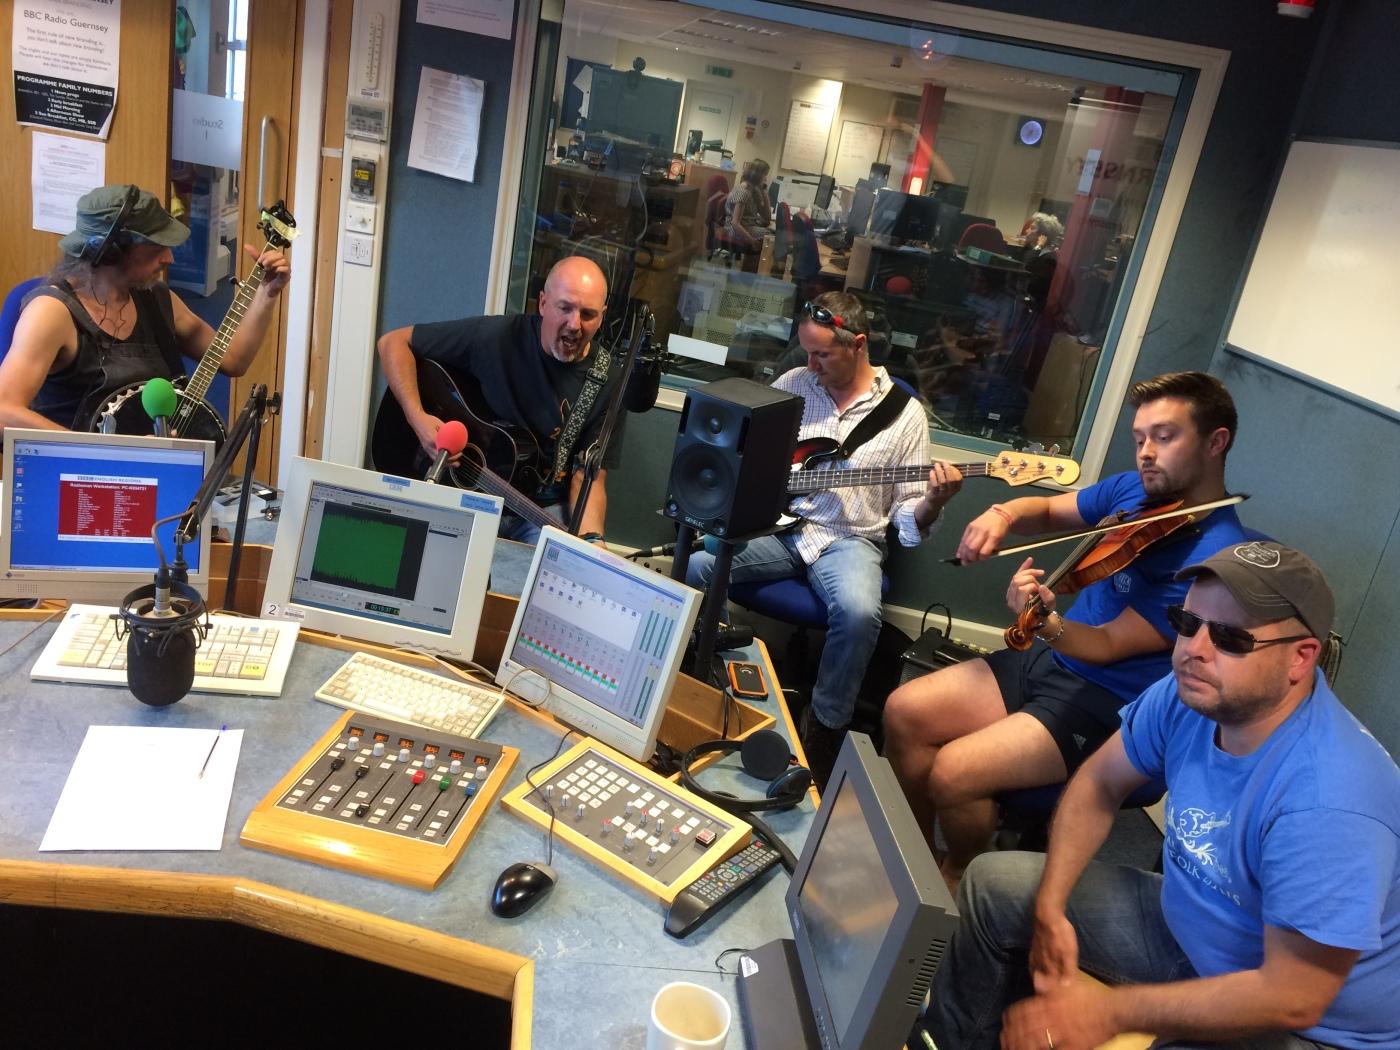 Clameur De Haro in the BBC Introducing Guernsey studio